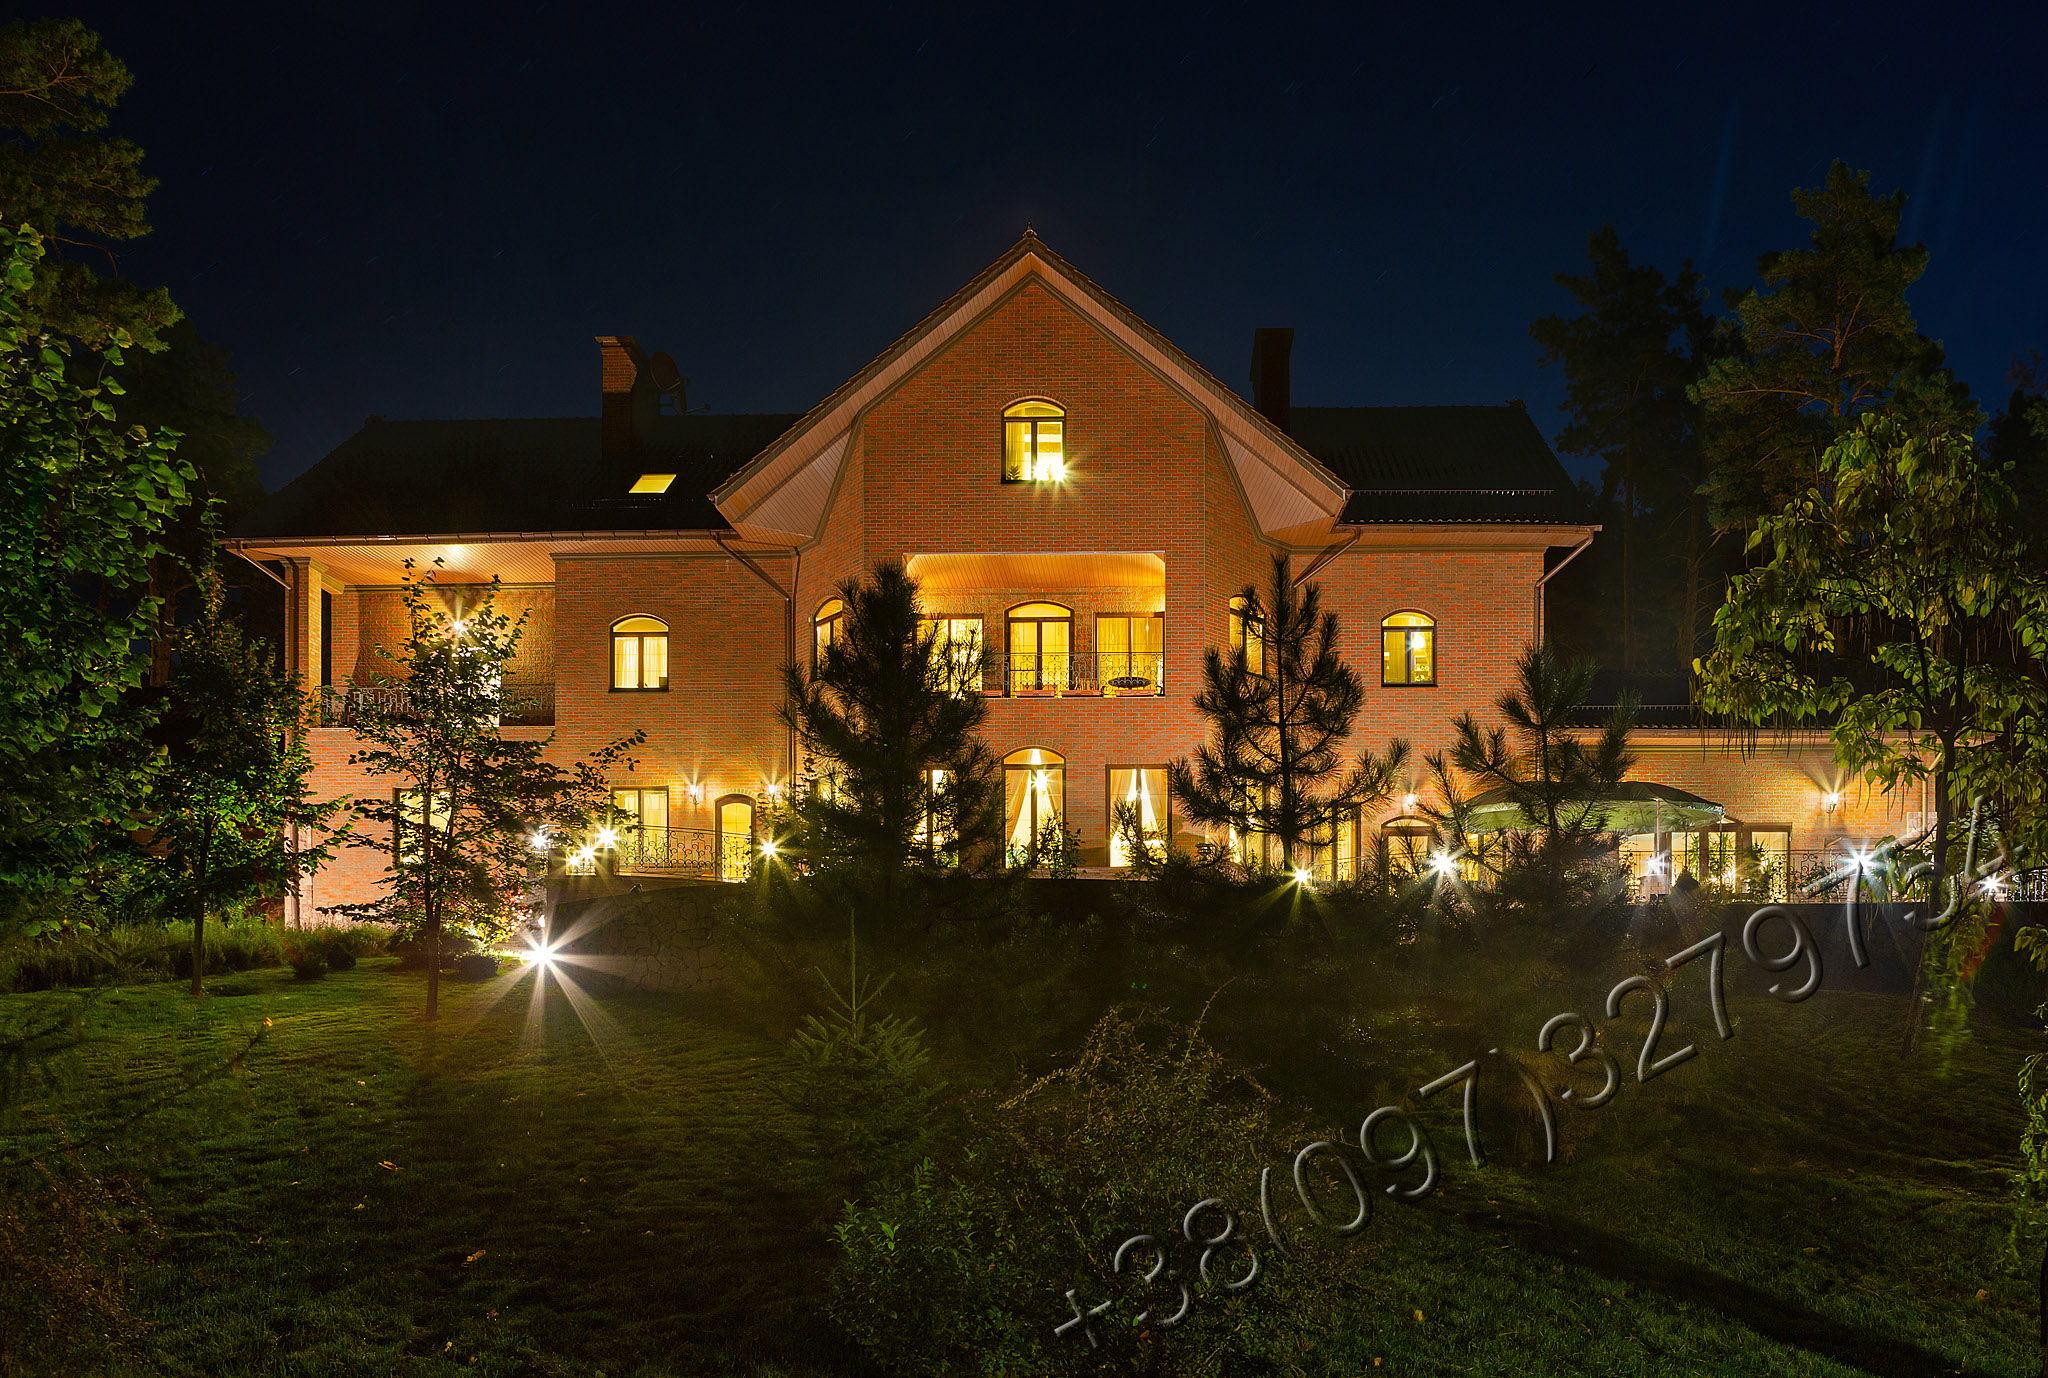 Дом W-5388608, 5-я Линия, 4, Киев - Фото 1